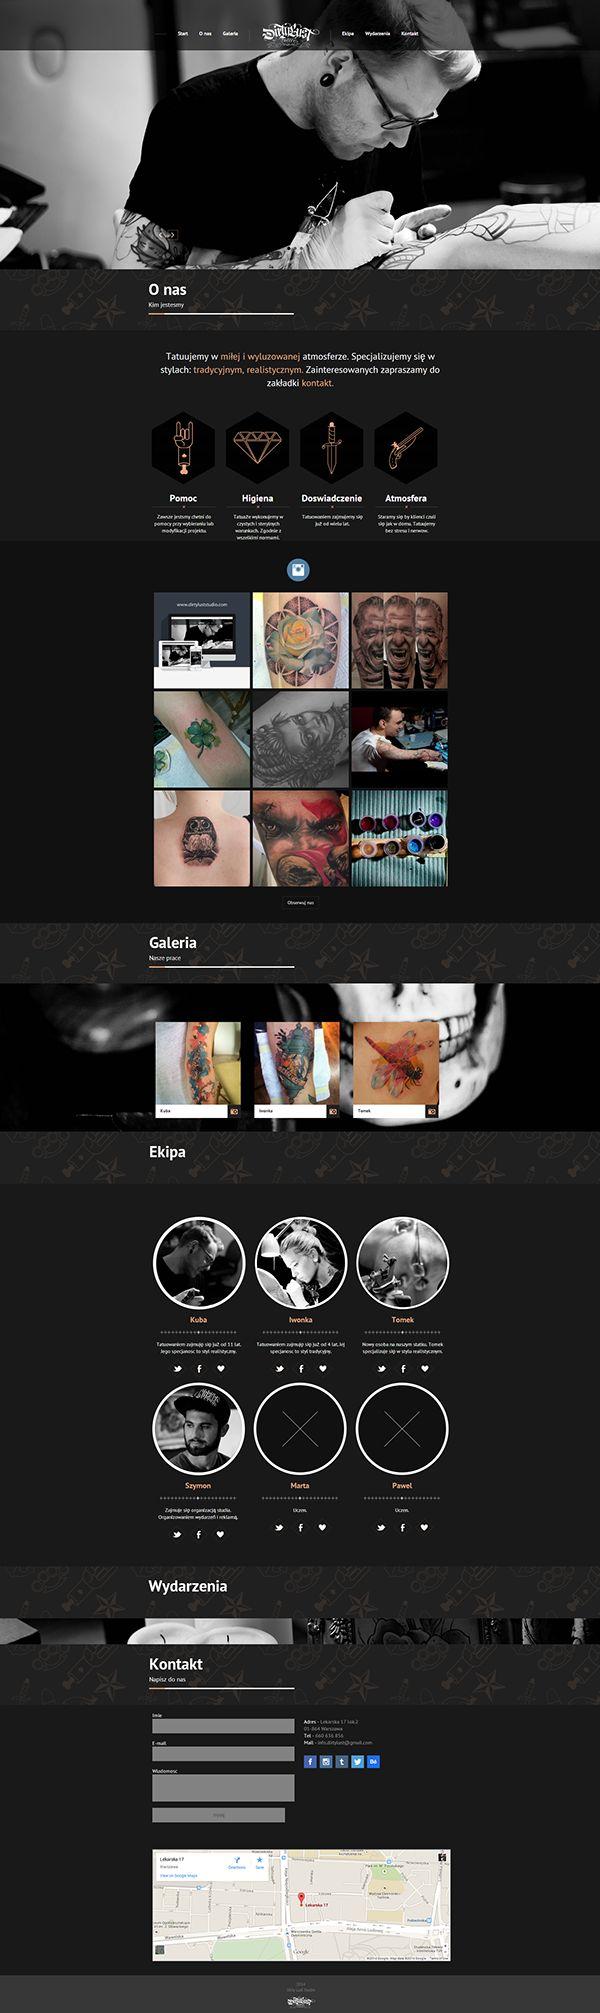 Tattoo Studio - Web Design on Behance